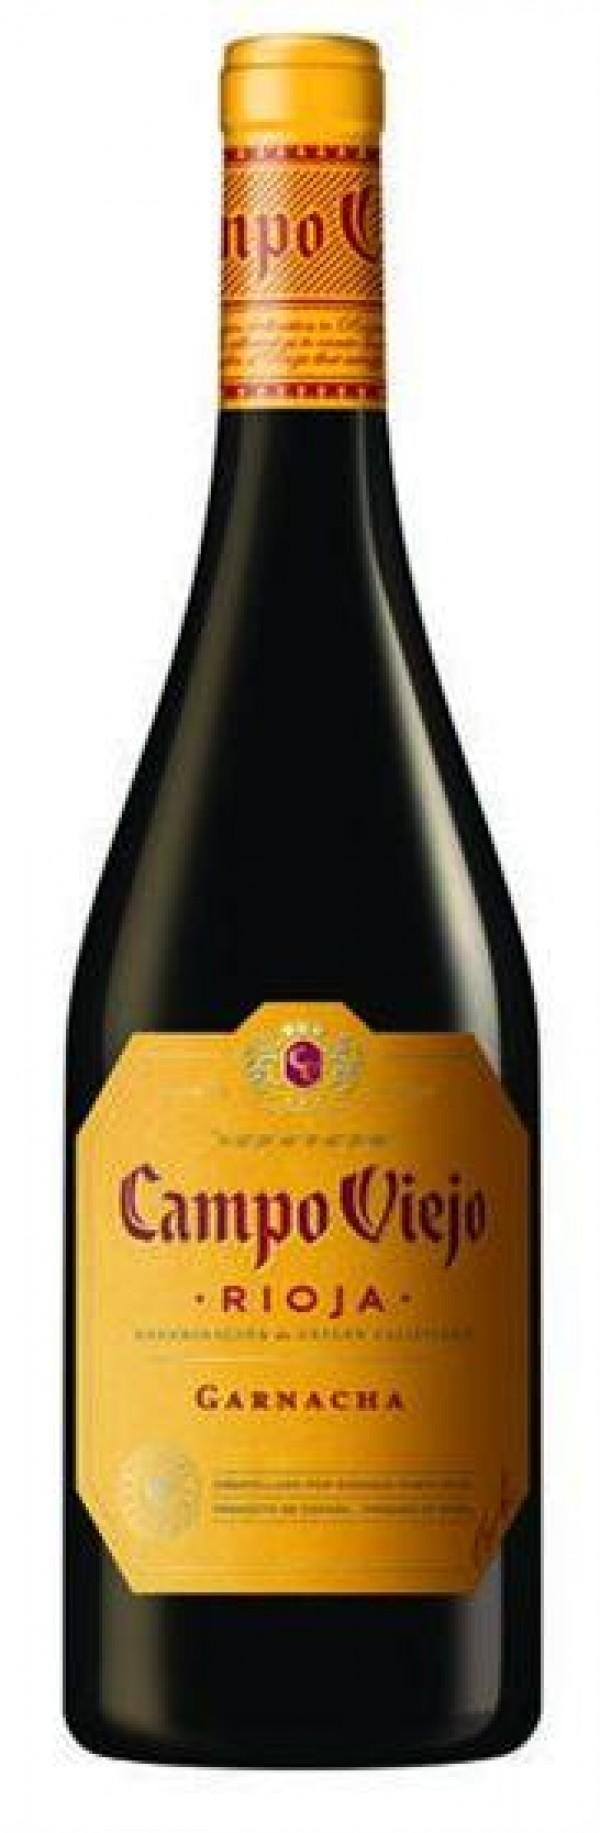 Campo Viejo Rioja Garnacha